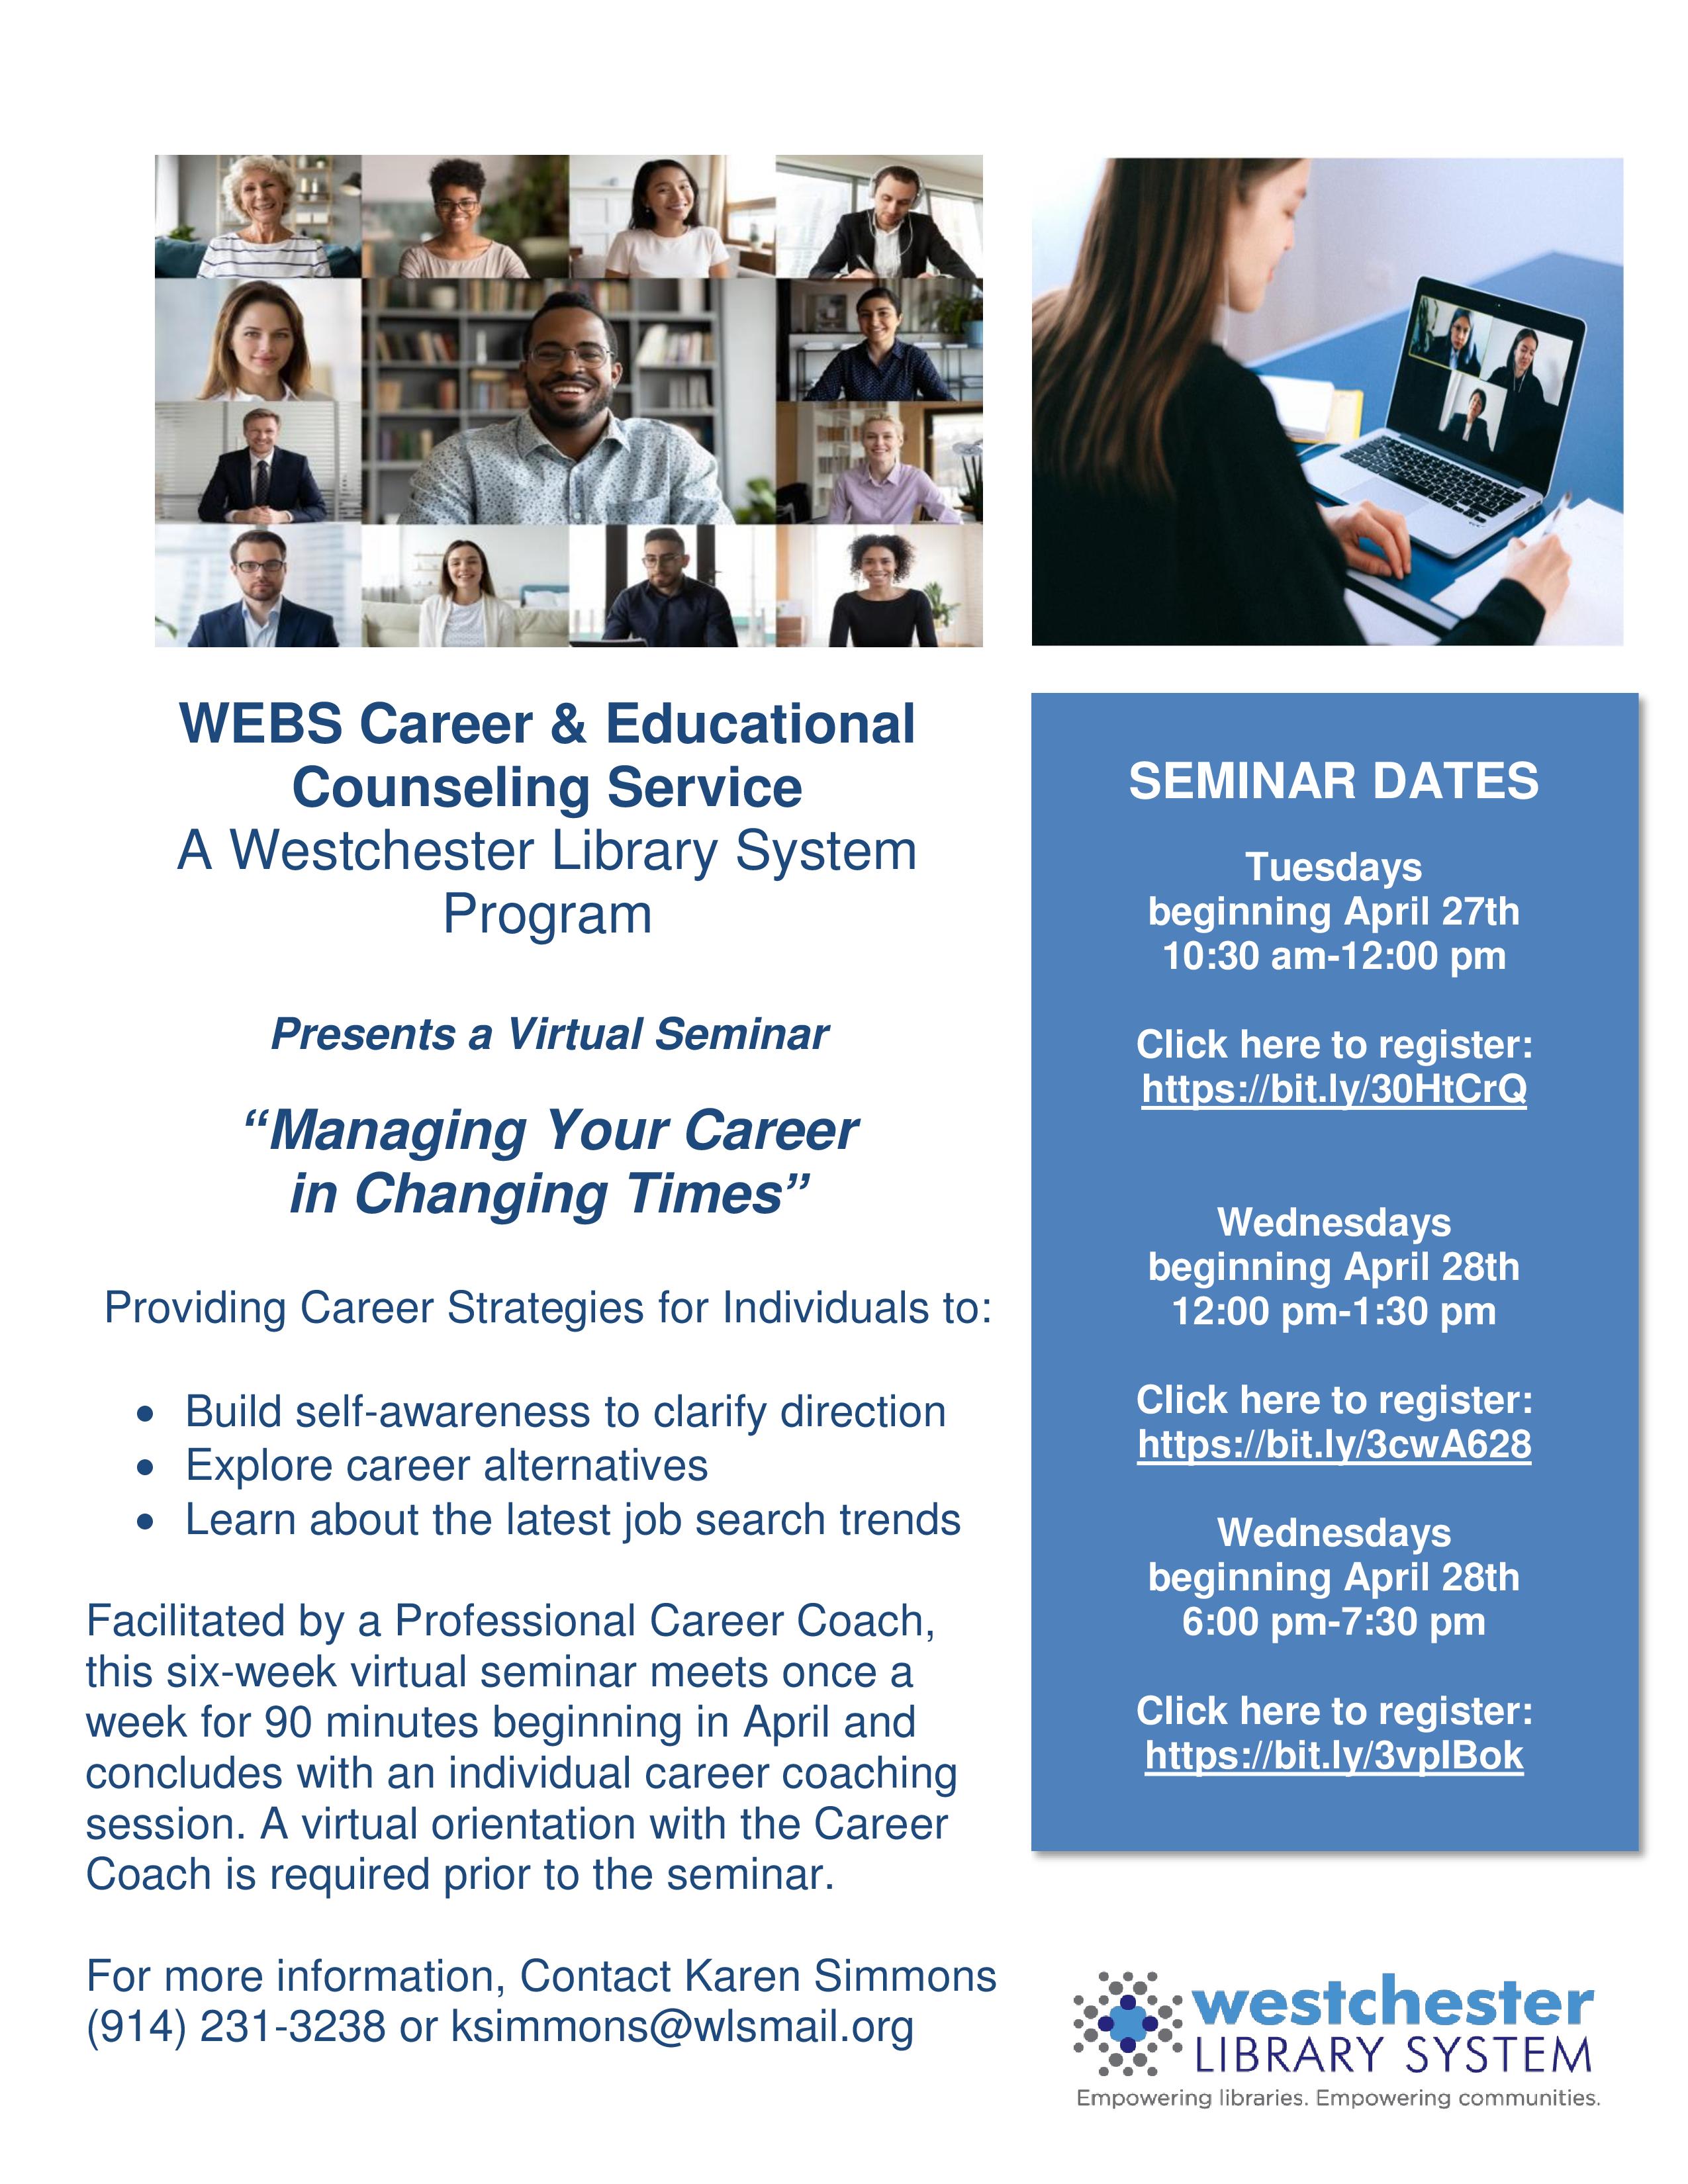 WEBS Virtual Career Seminar